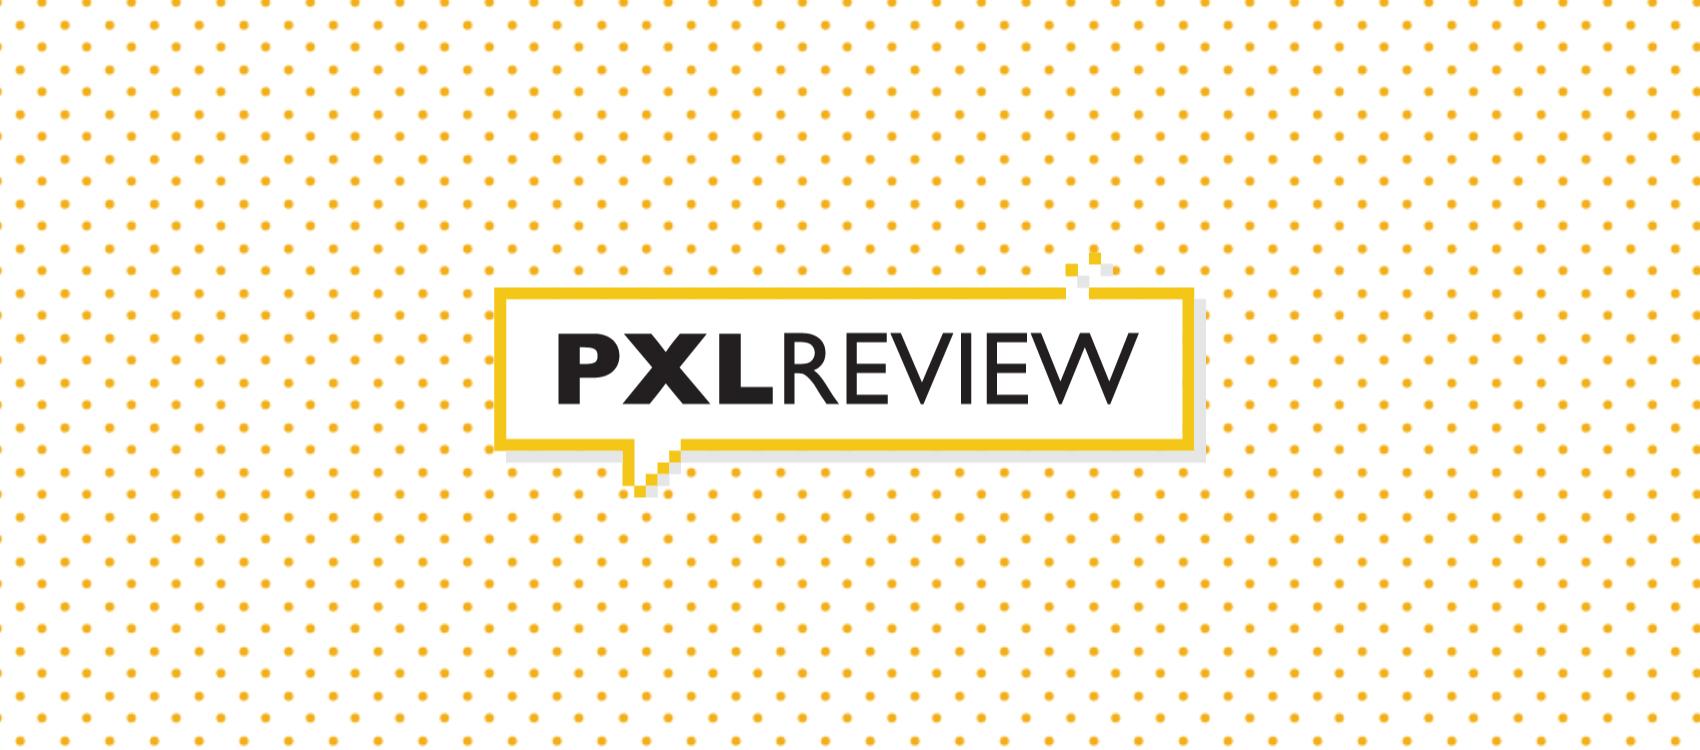 PXL Review Header